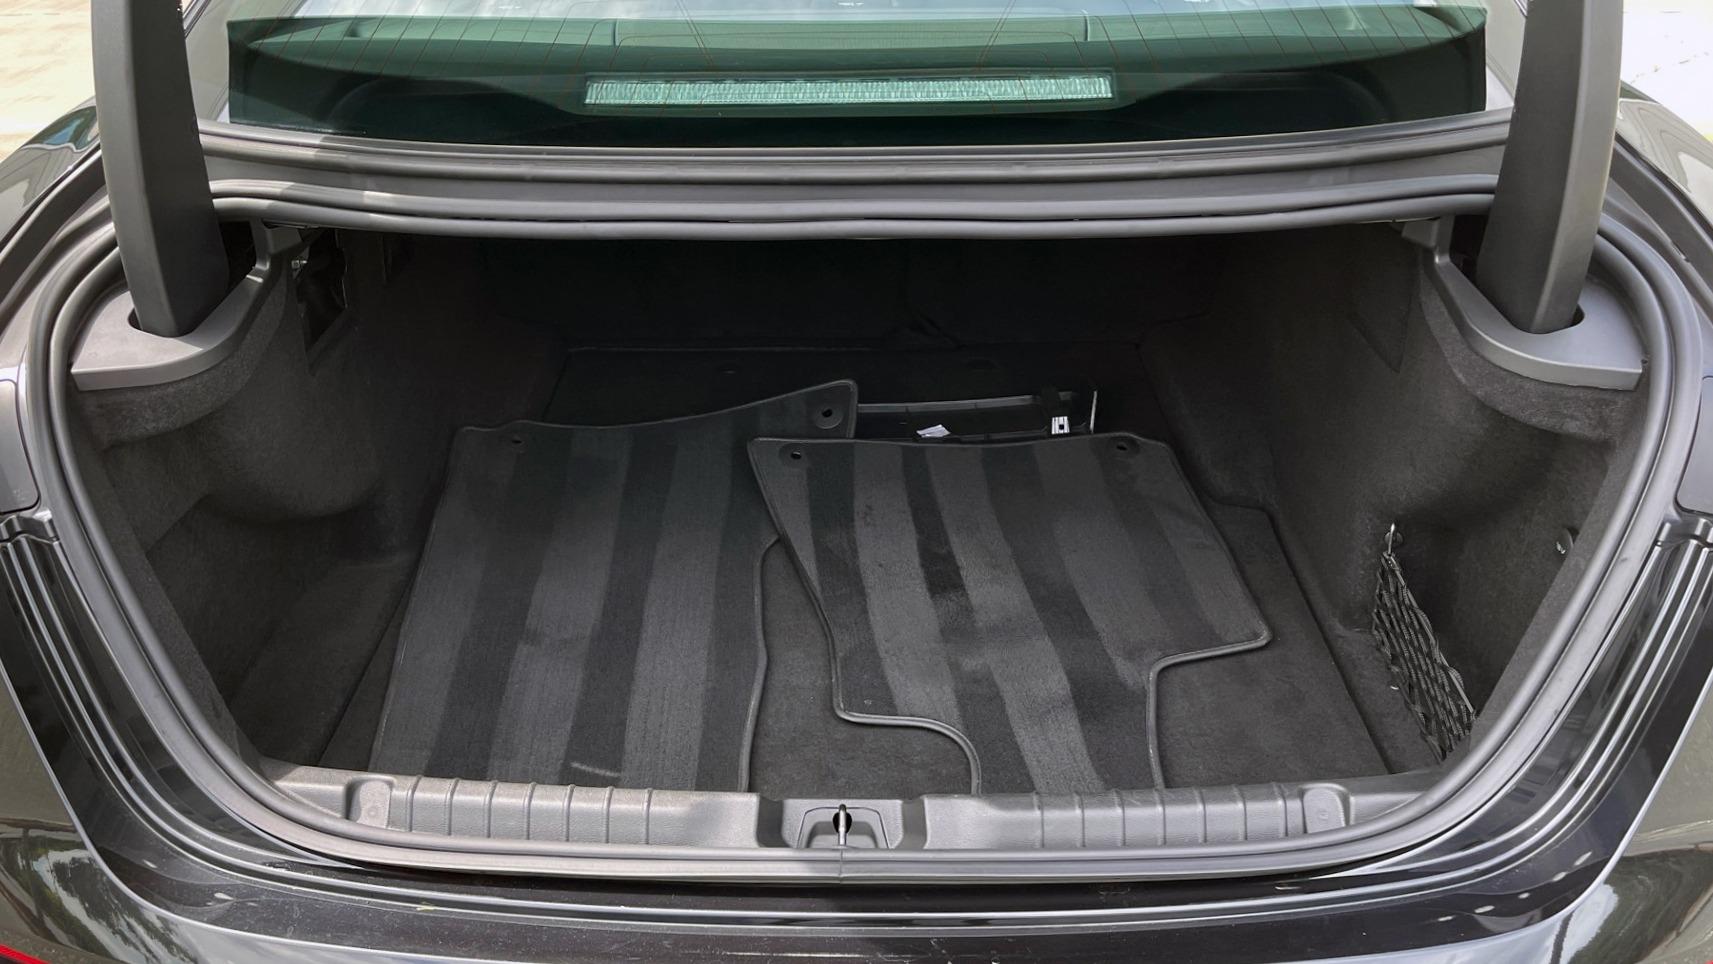 Used 2018 Maserati GHIBLI S Q4 SEDAN / AWD / 3.0L V6 / SUNROOF / NAV / REARVIEW for sale $51,995 at Formula Imports in Charlotte NC 28227 16